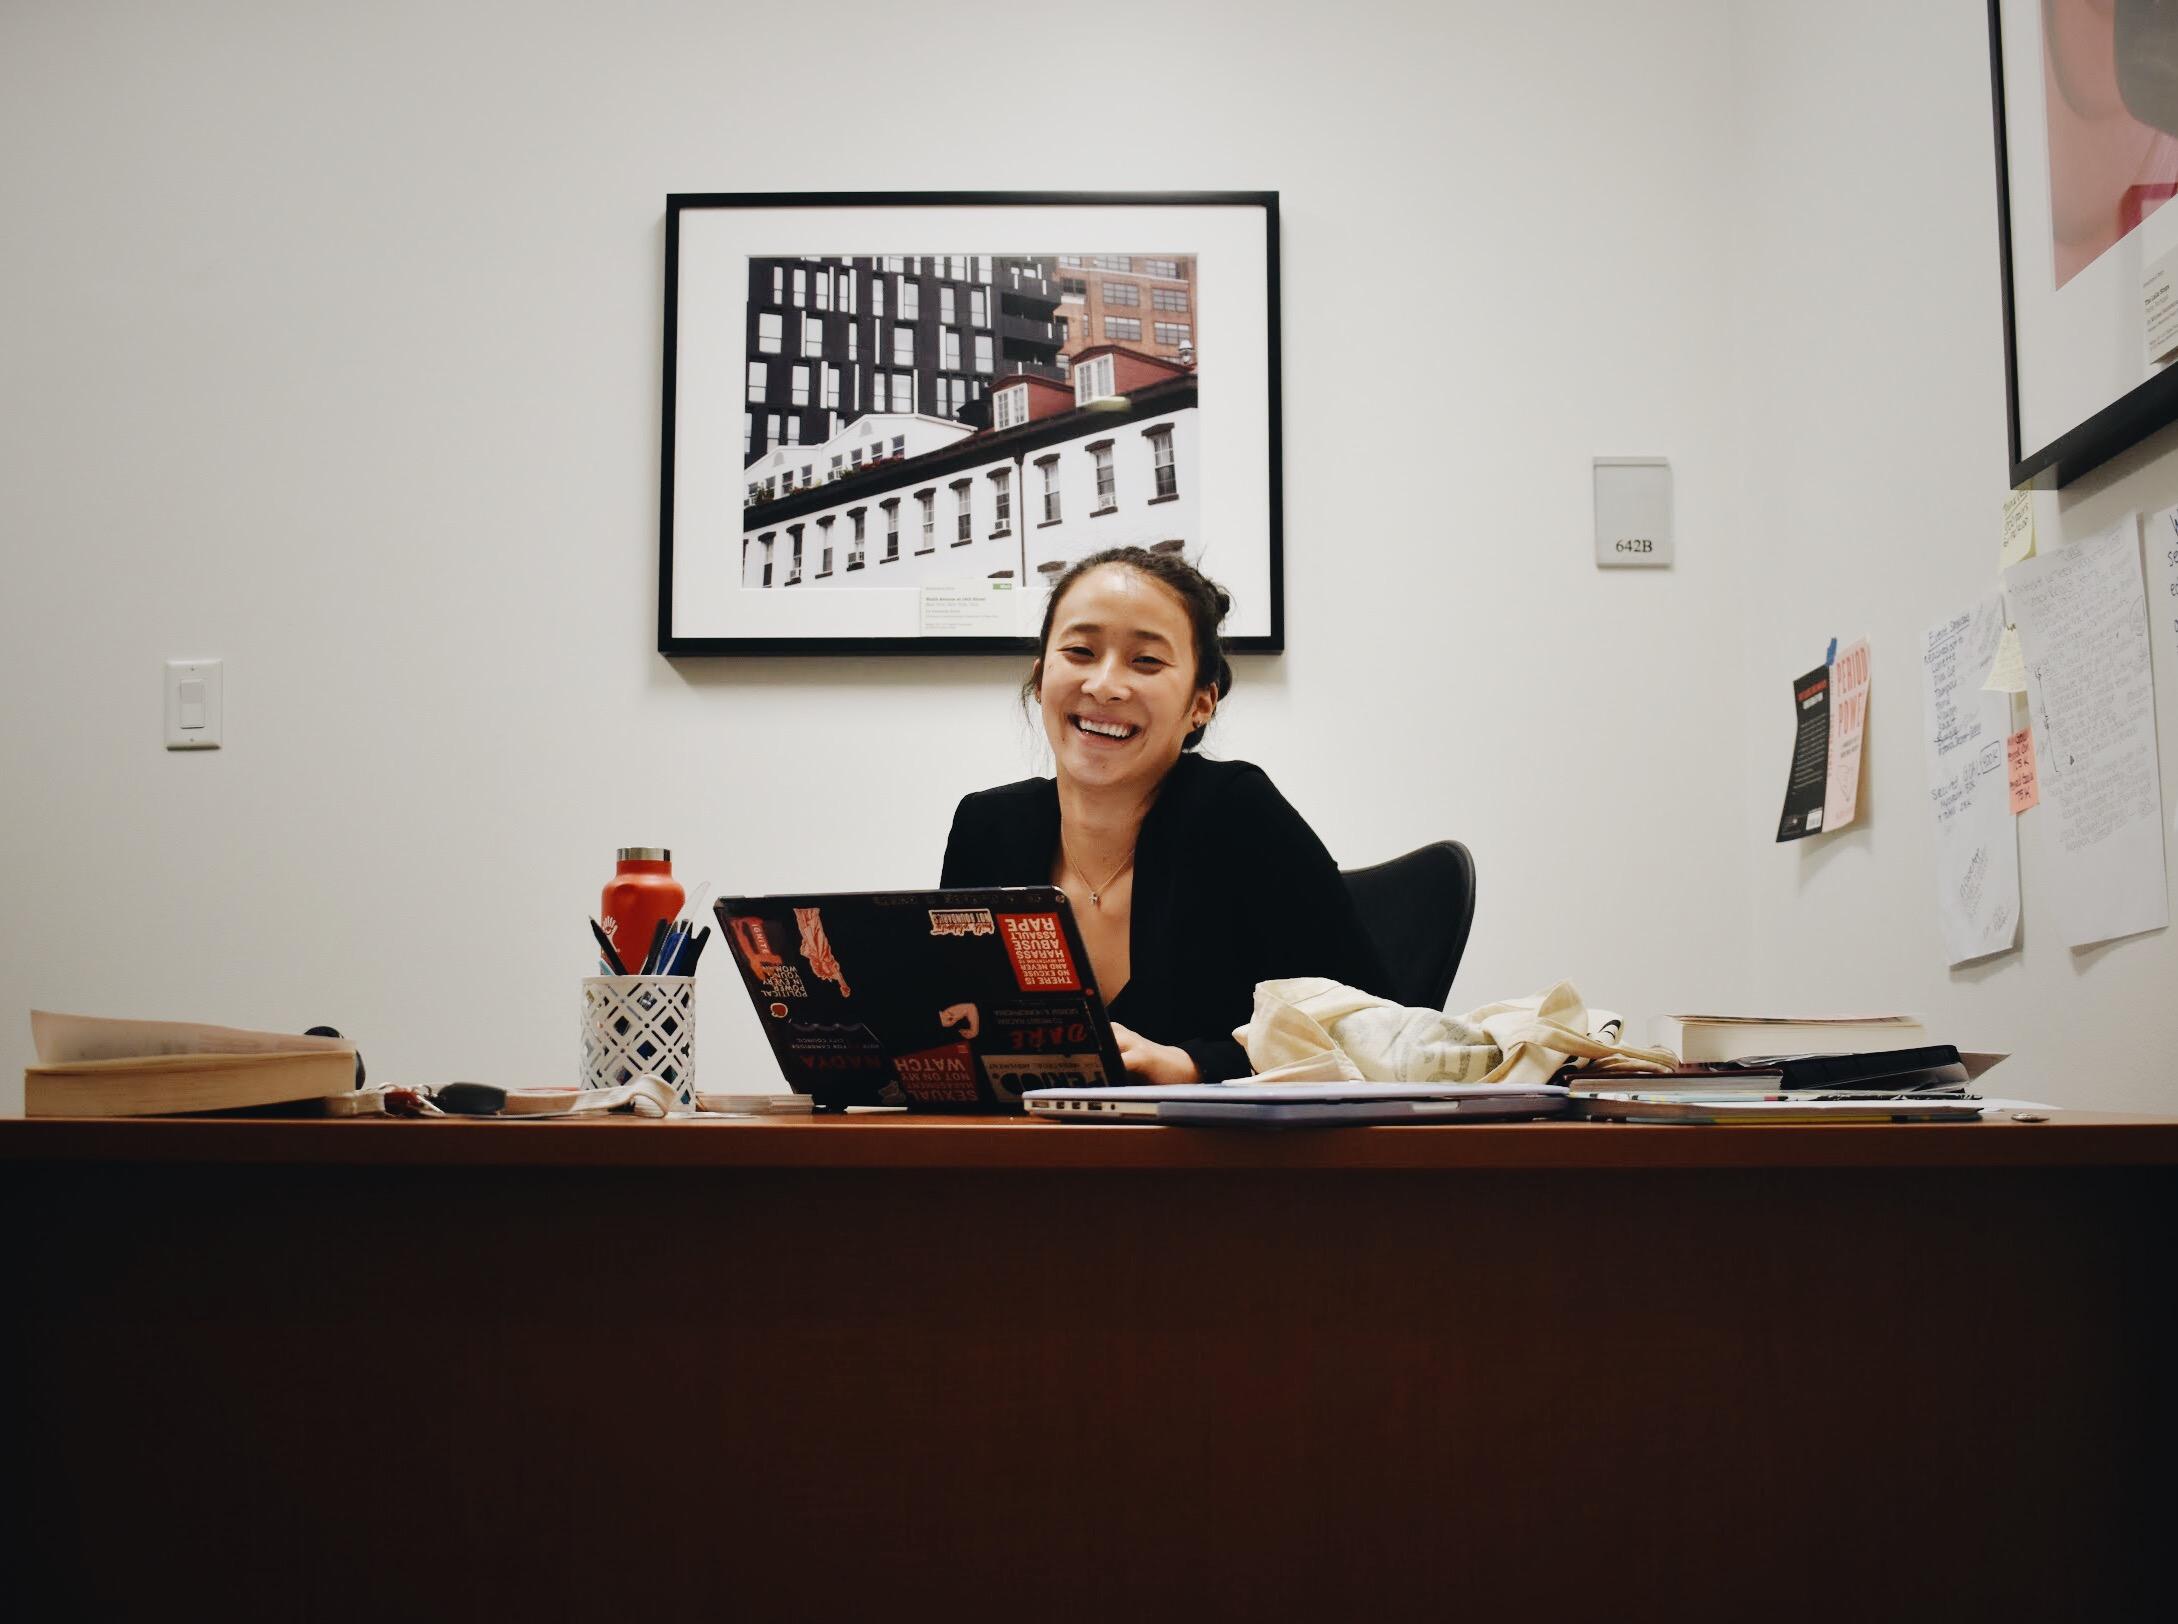 Nadya Okamoto at her desk in PERIOD's New York office. (Courtesy of McKinley Tretler / Malala Fund)